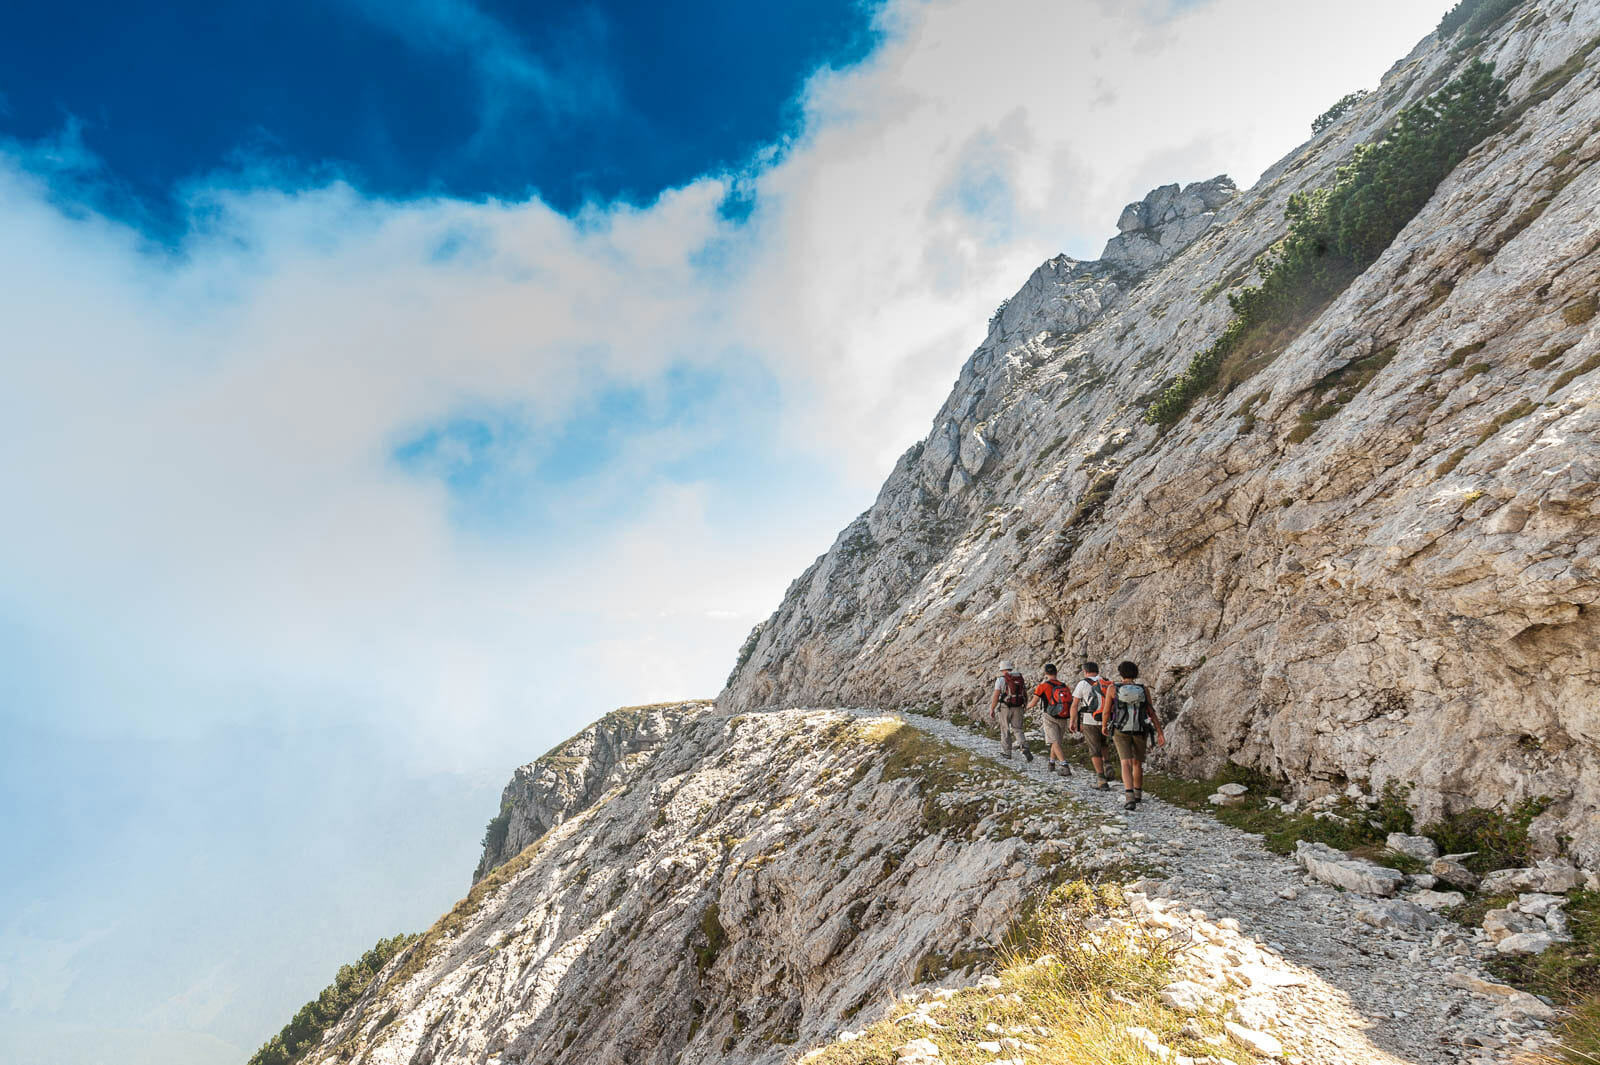 monte baldo peaks trekking route to cima telegrafo